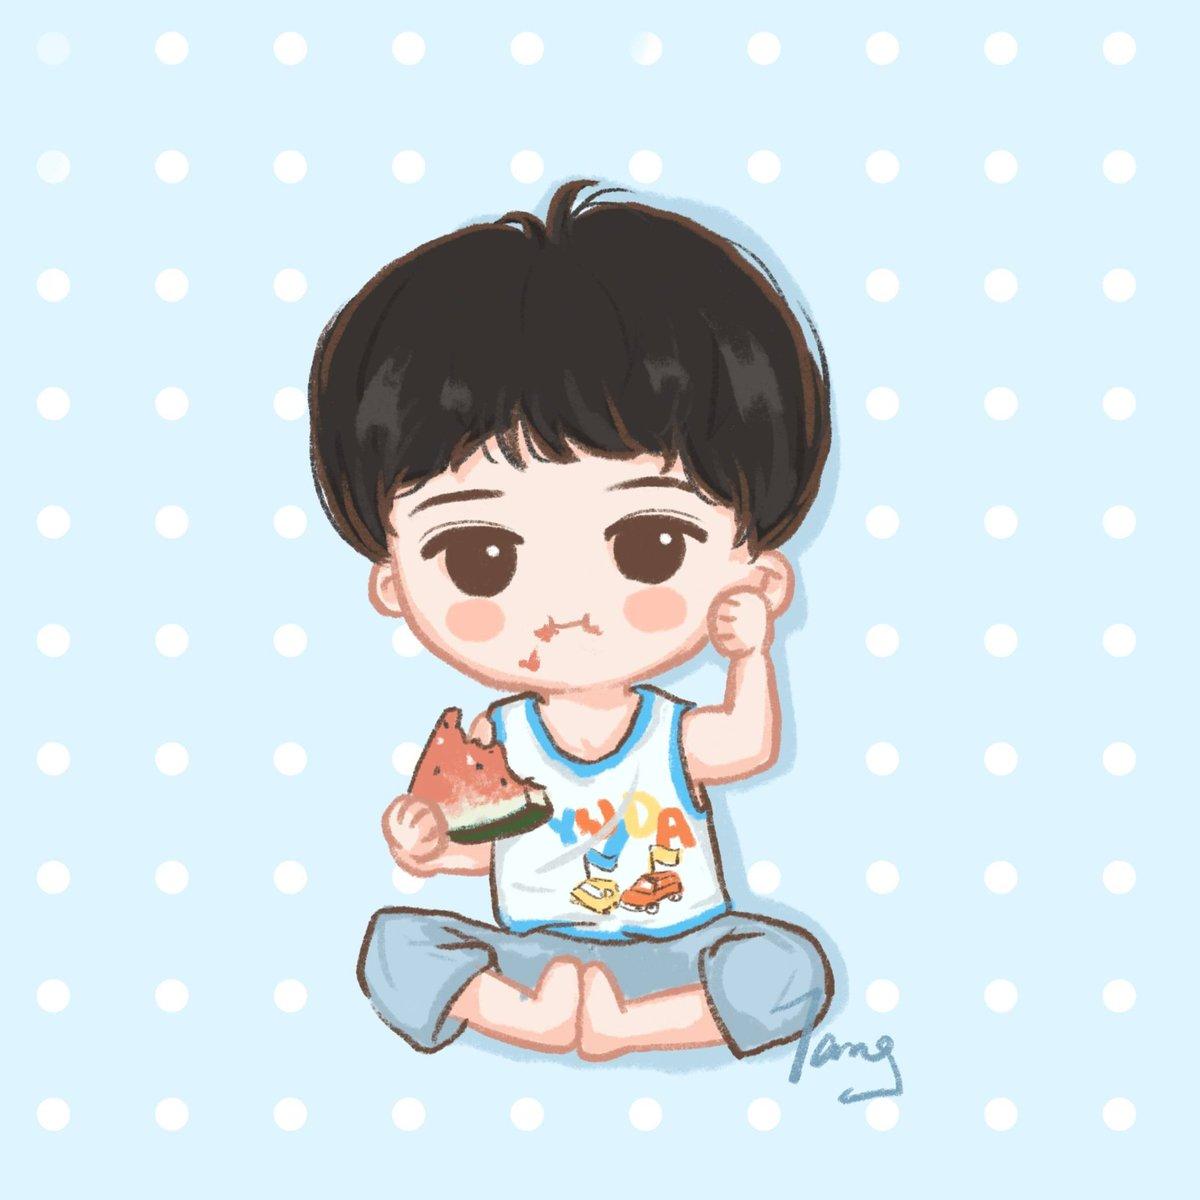 Baby Choi loves watermelon 🍉 #SIWON #최시원 #시원 [© 宝蓝色桃乐茜] https://t.co/Z24UYzJNne